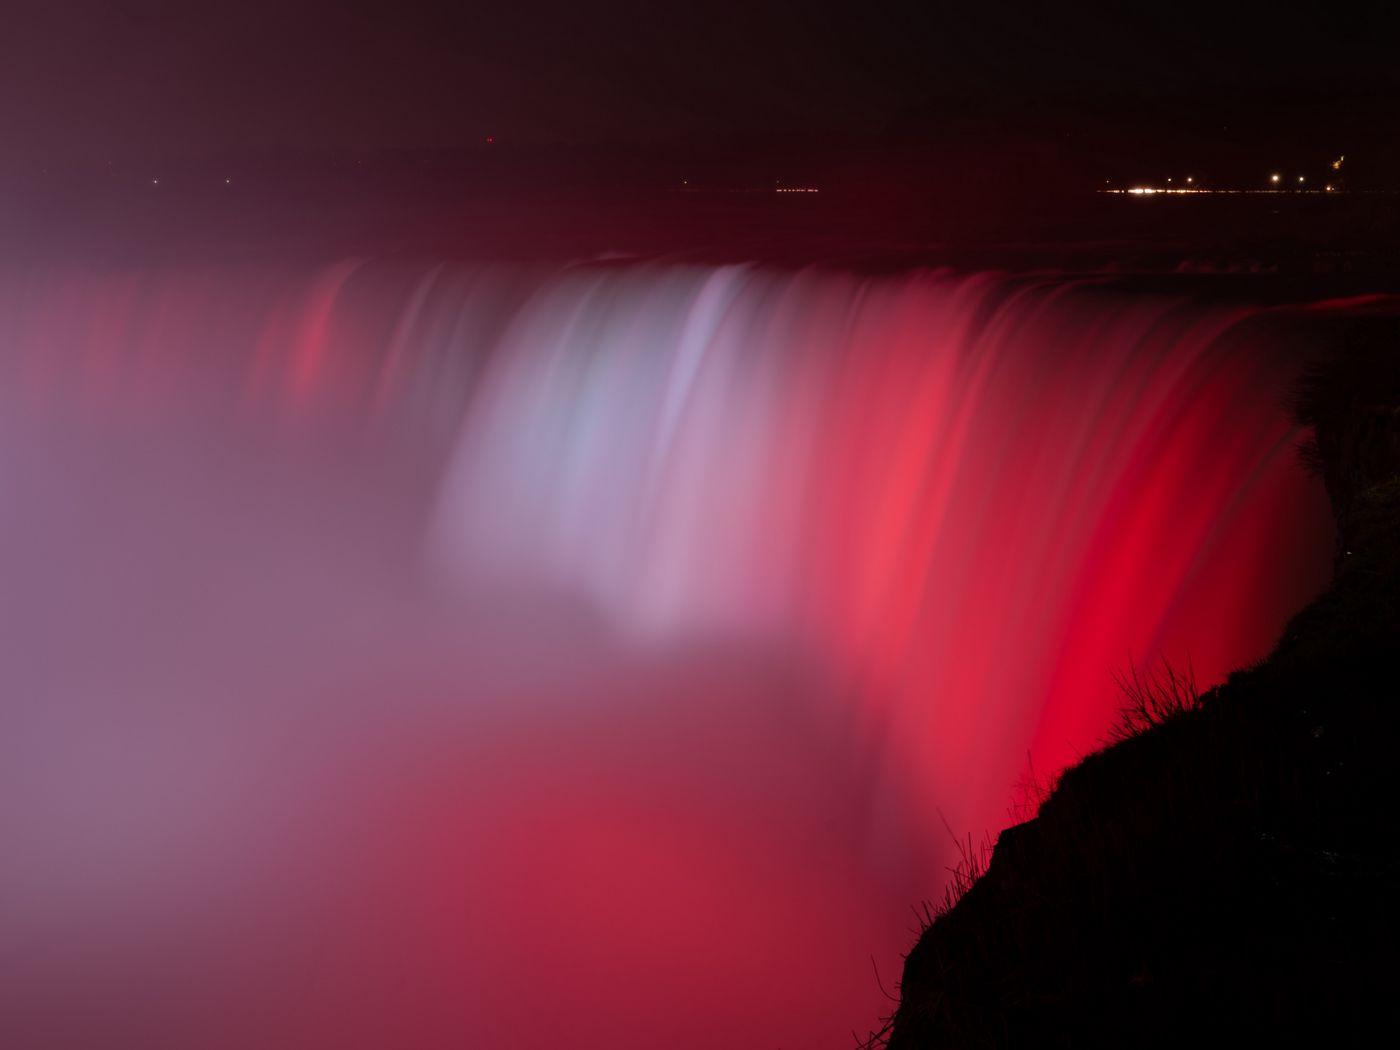 1400x1050 Wallpaper waterfall, fog, backlight, red, dark